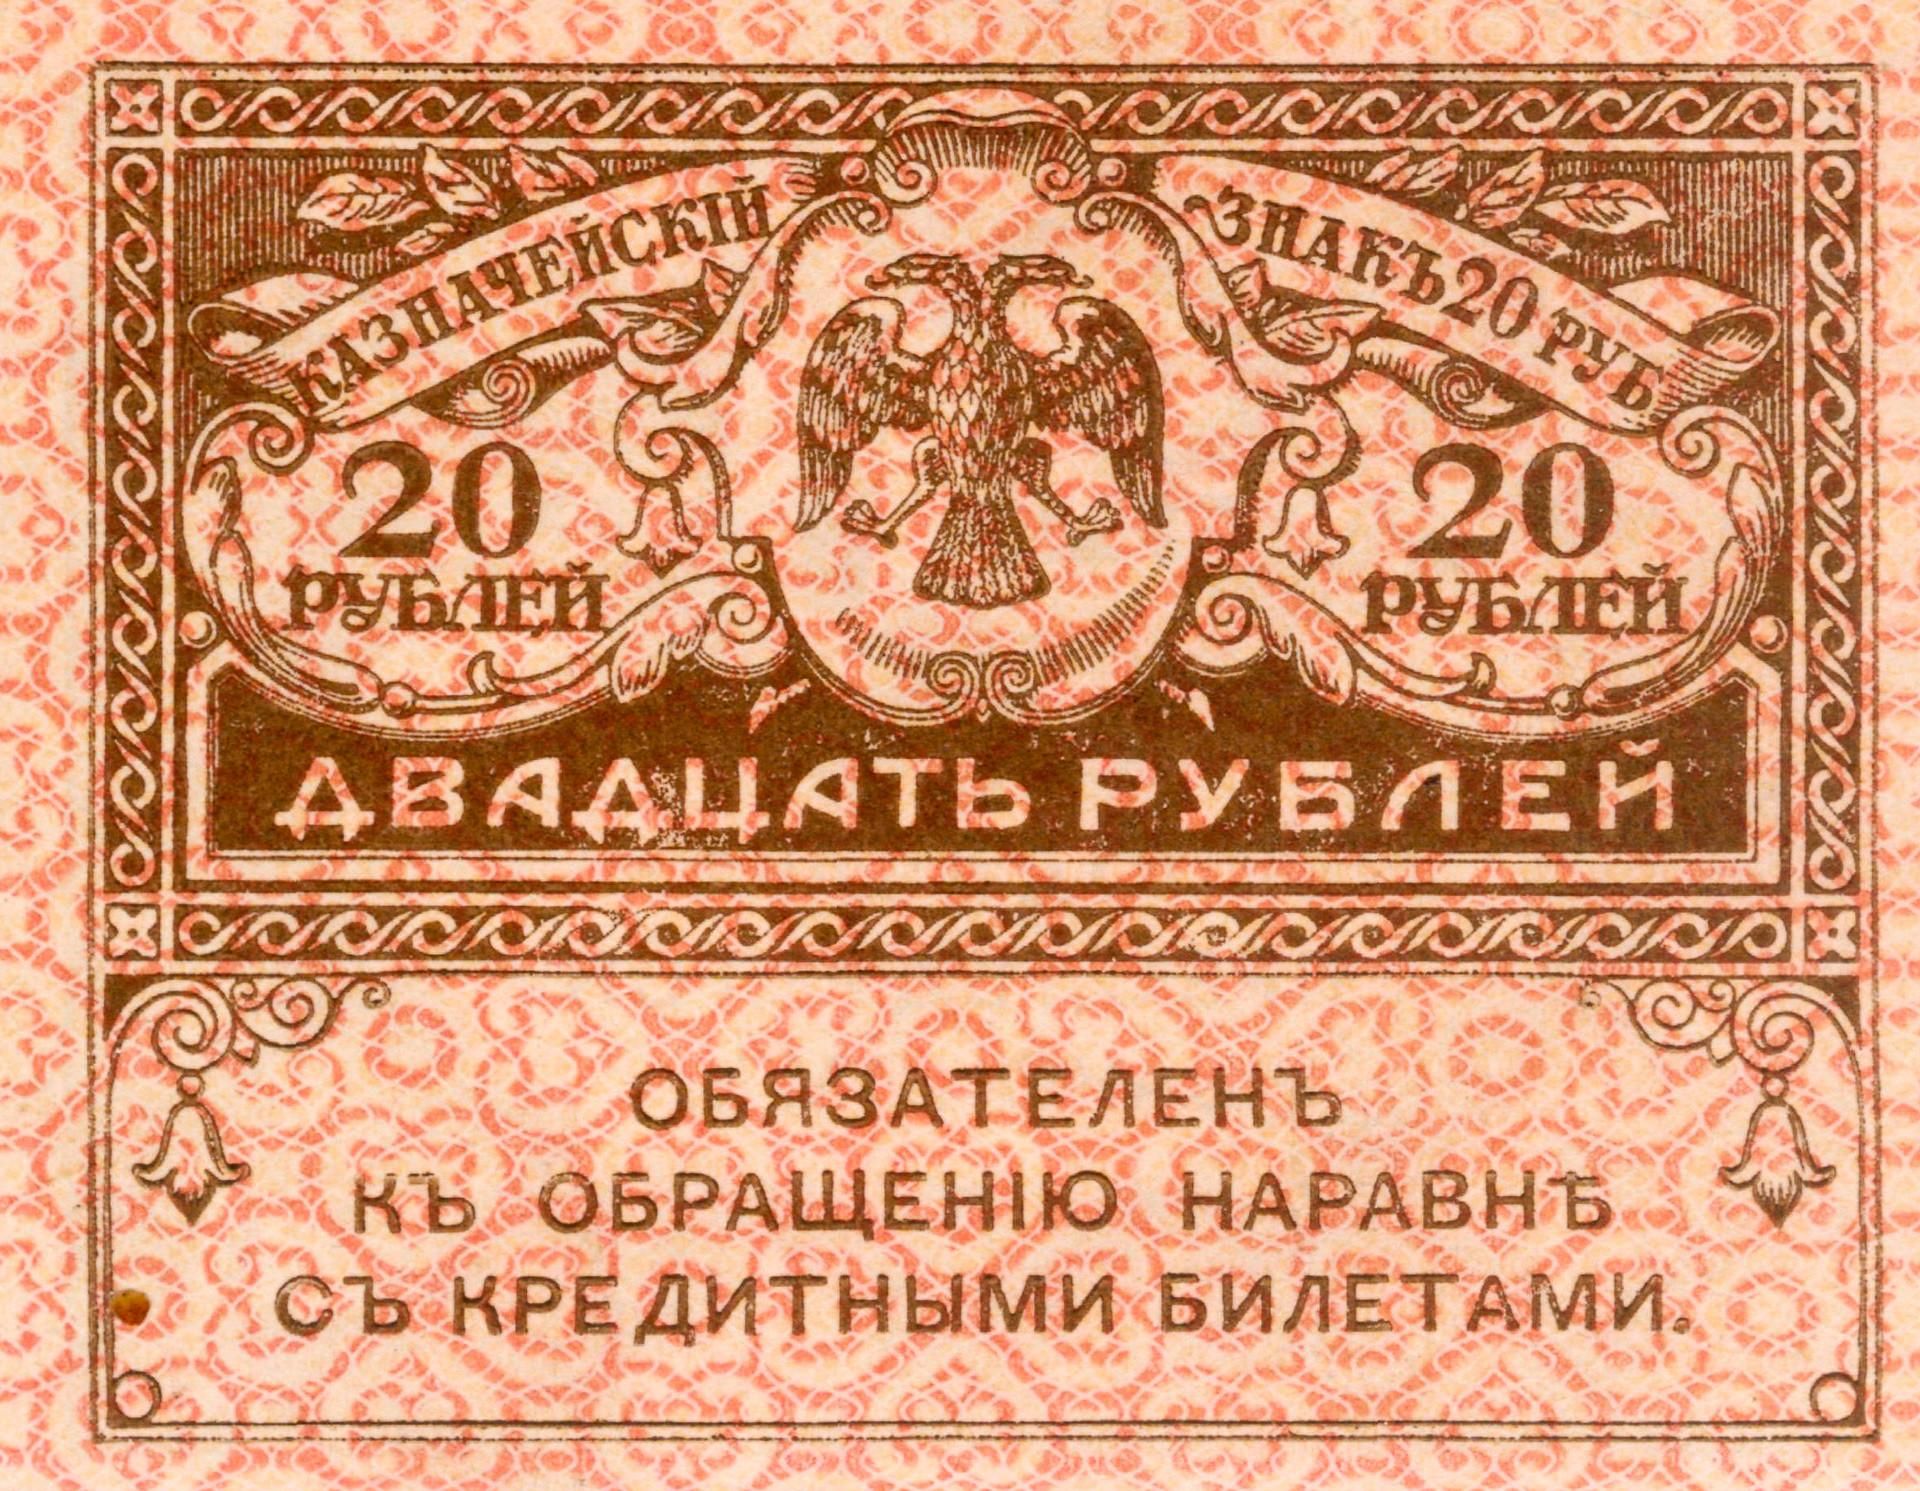 Kerenki (20 rubles)